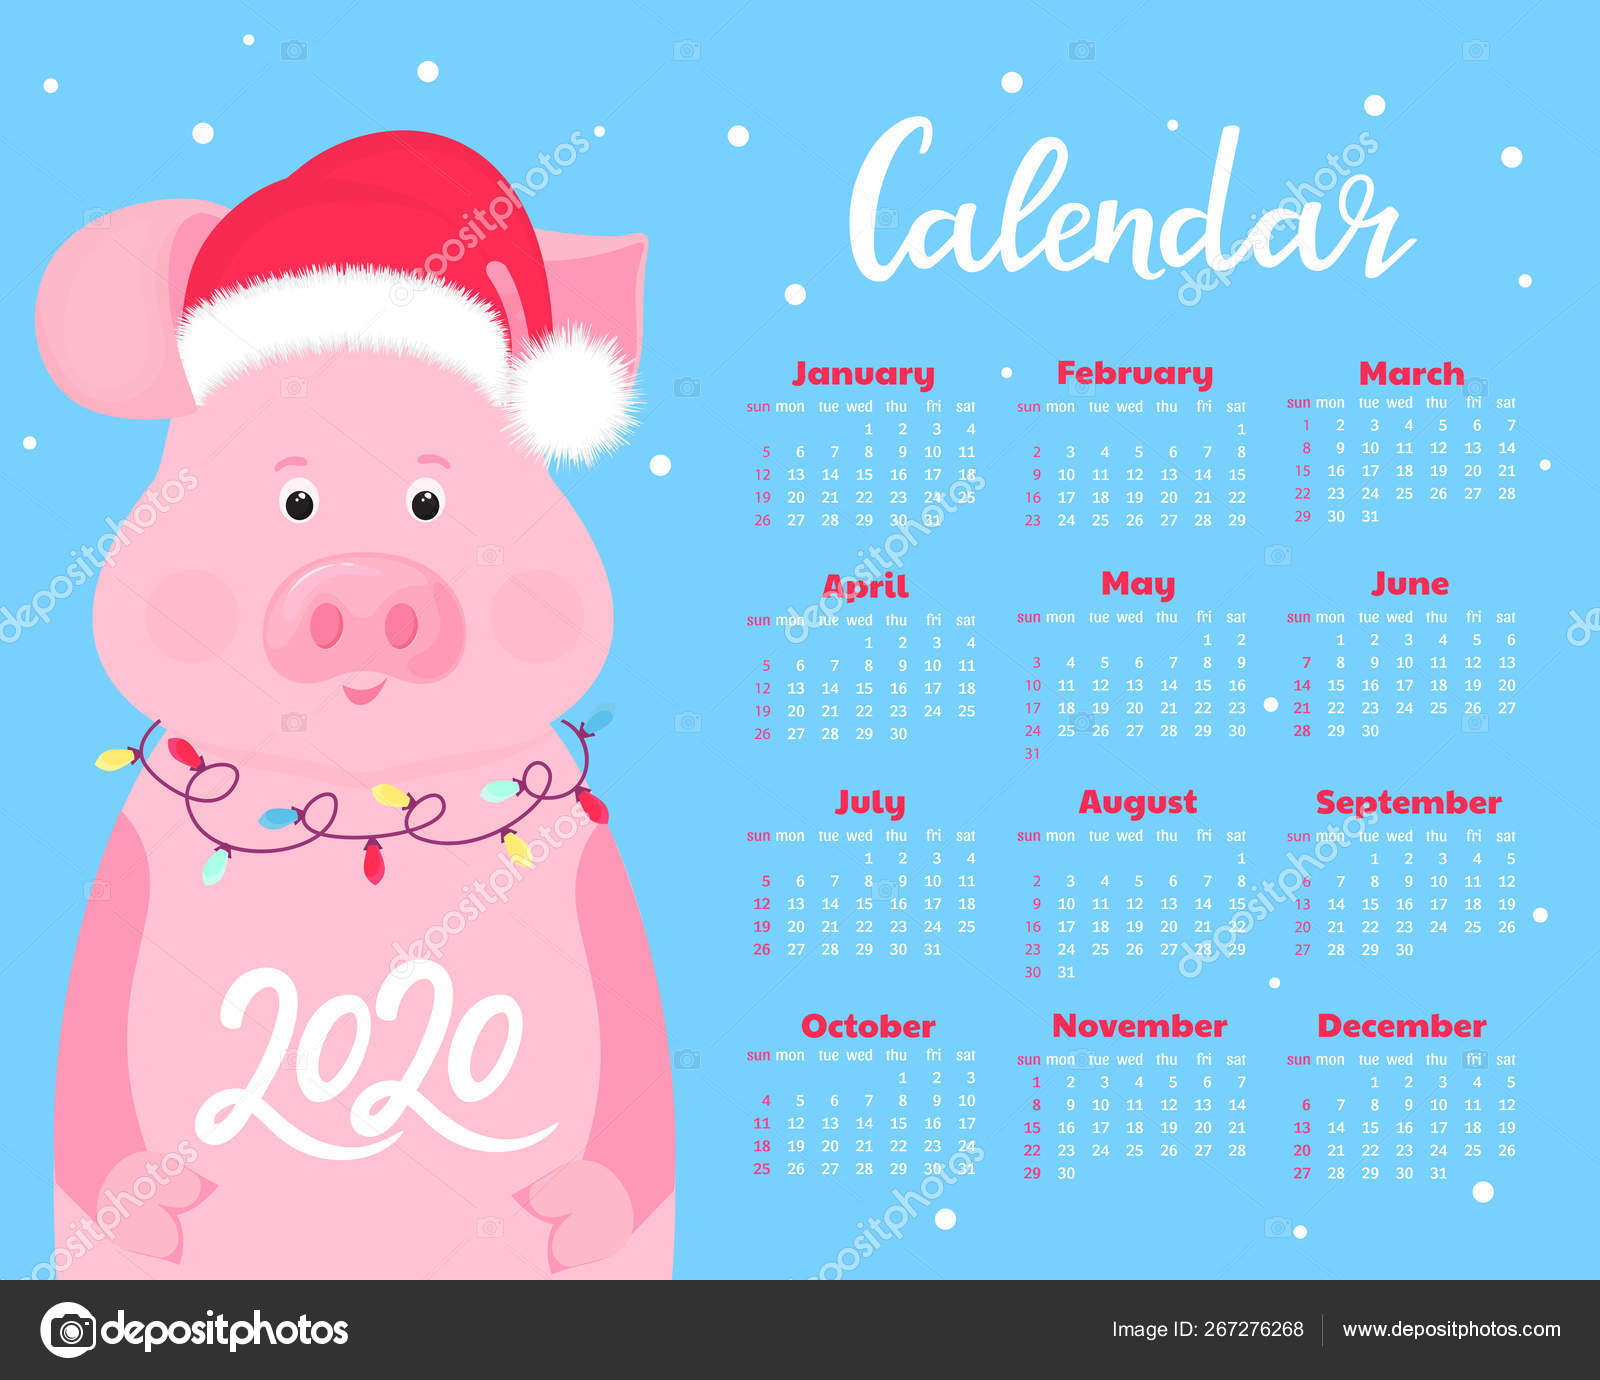 December Calendar 2020 Santa Calendar for 2020. Week start on Sunday. Cute pig in a hat of